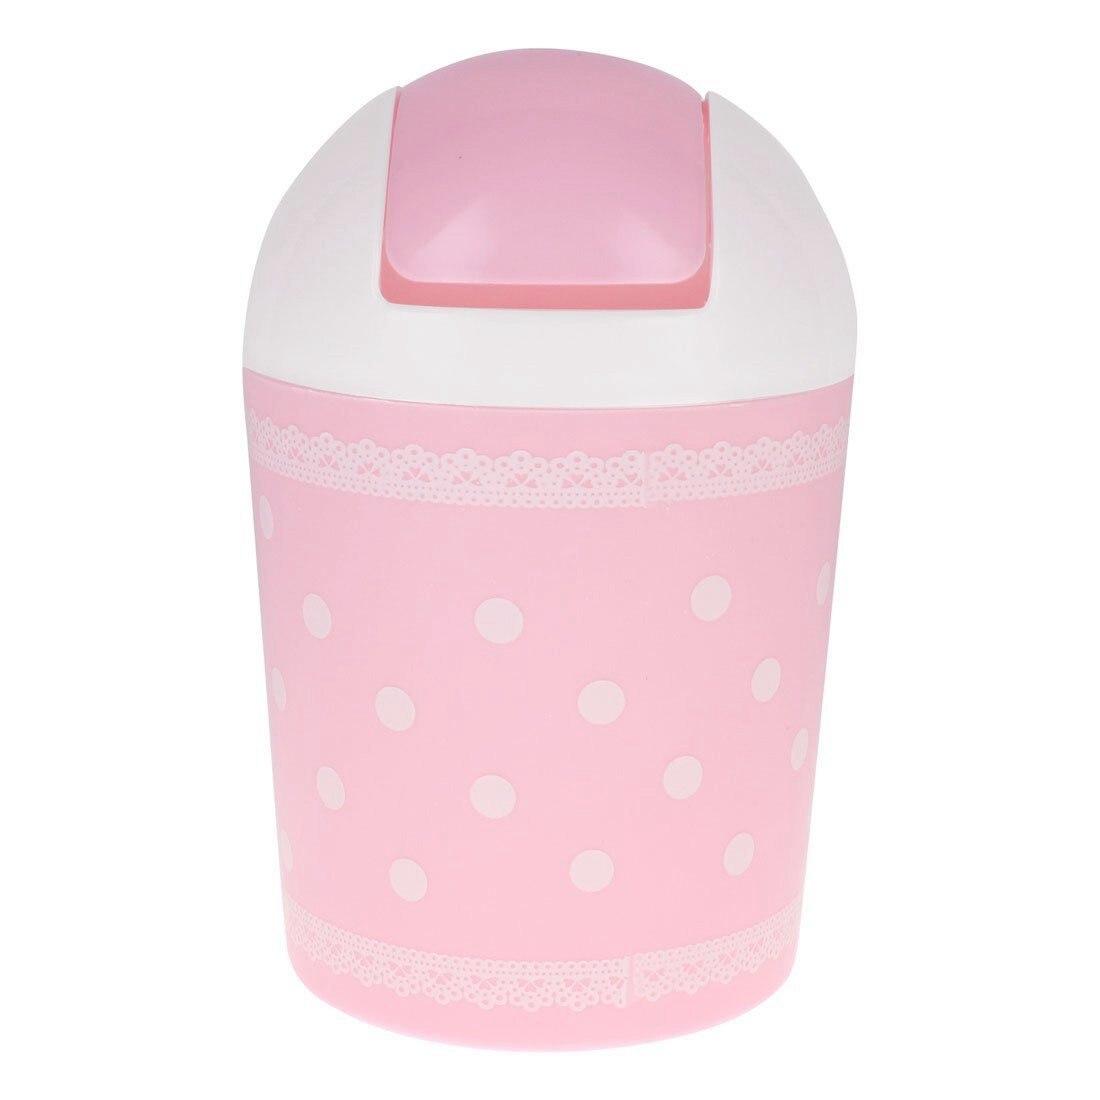 HOT-Design of lace garbage pink garbage can